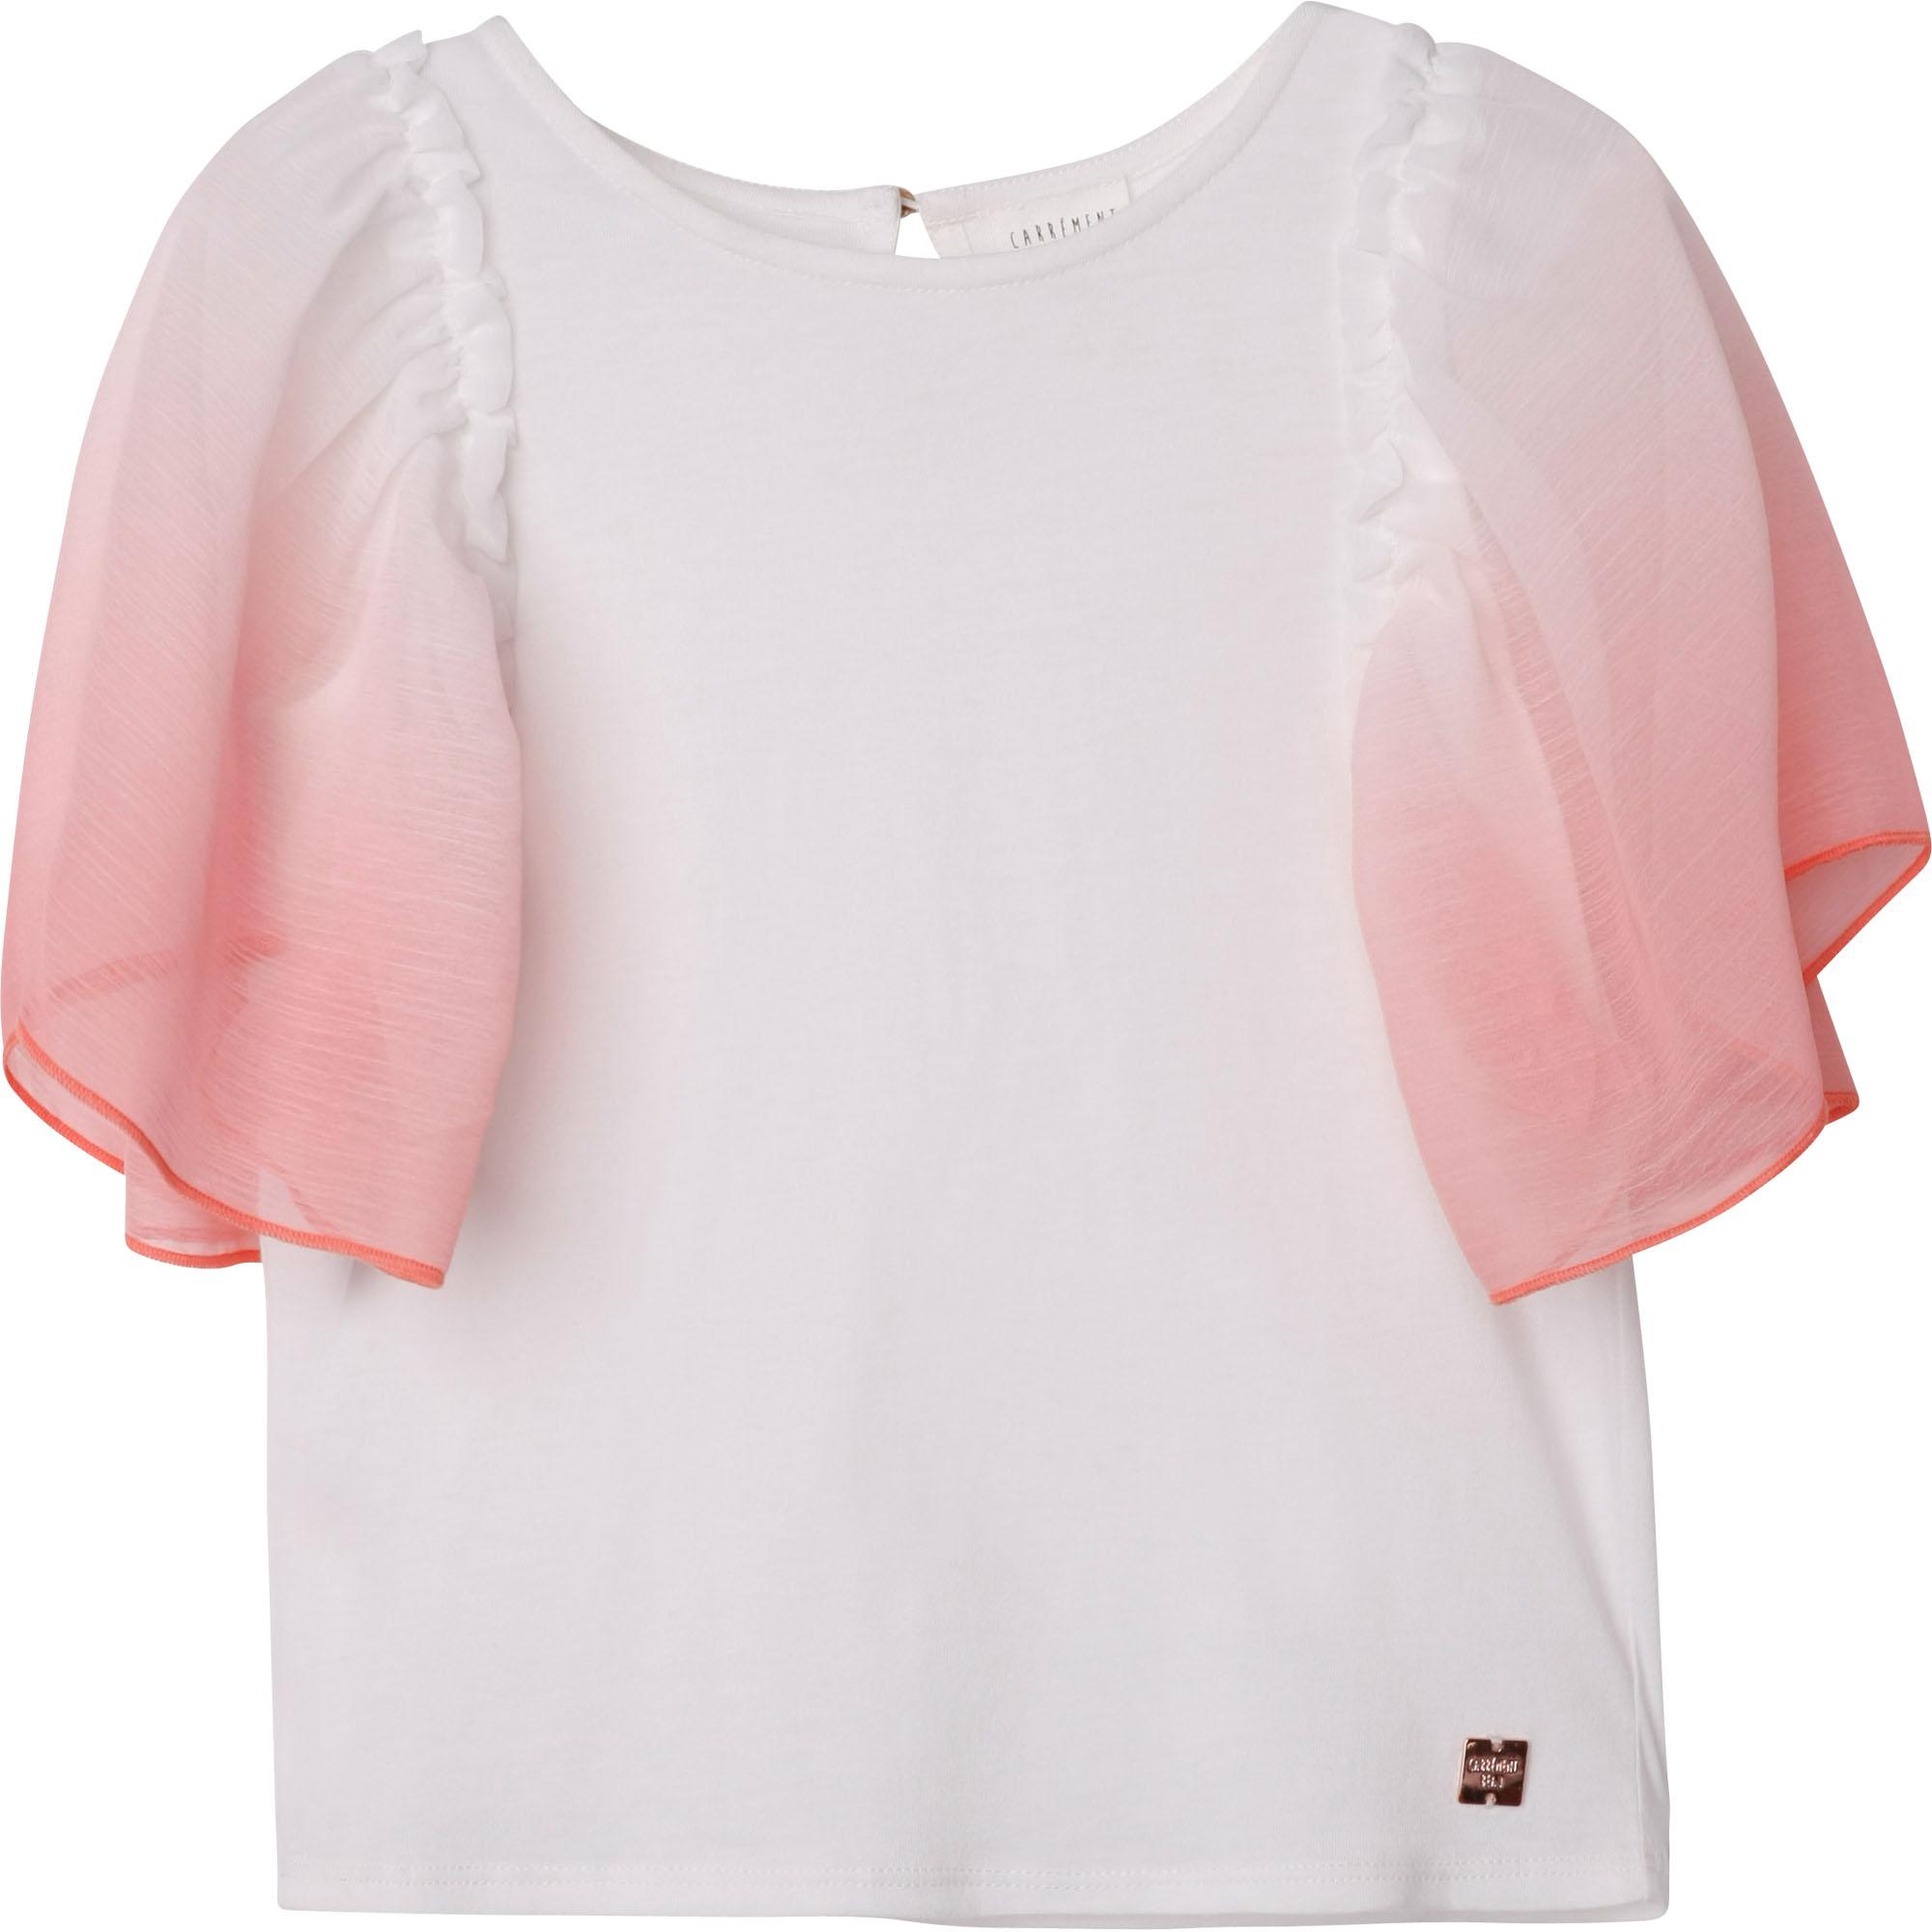 Dip-dye formal T-shirt CARREMENT BEAU for GIRL